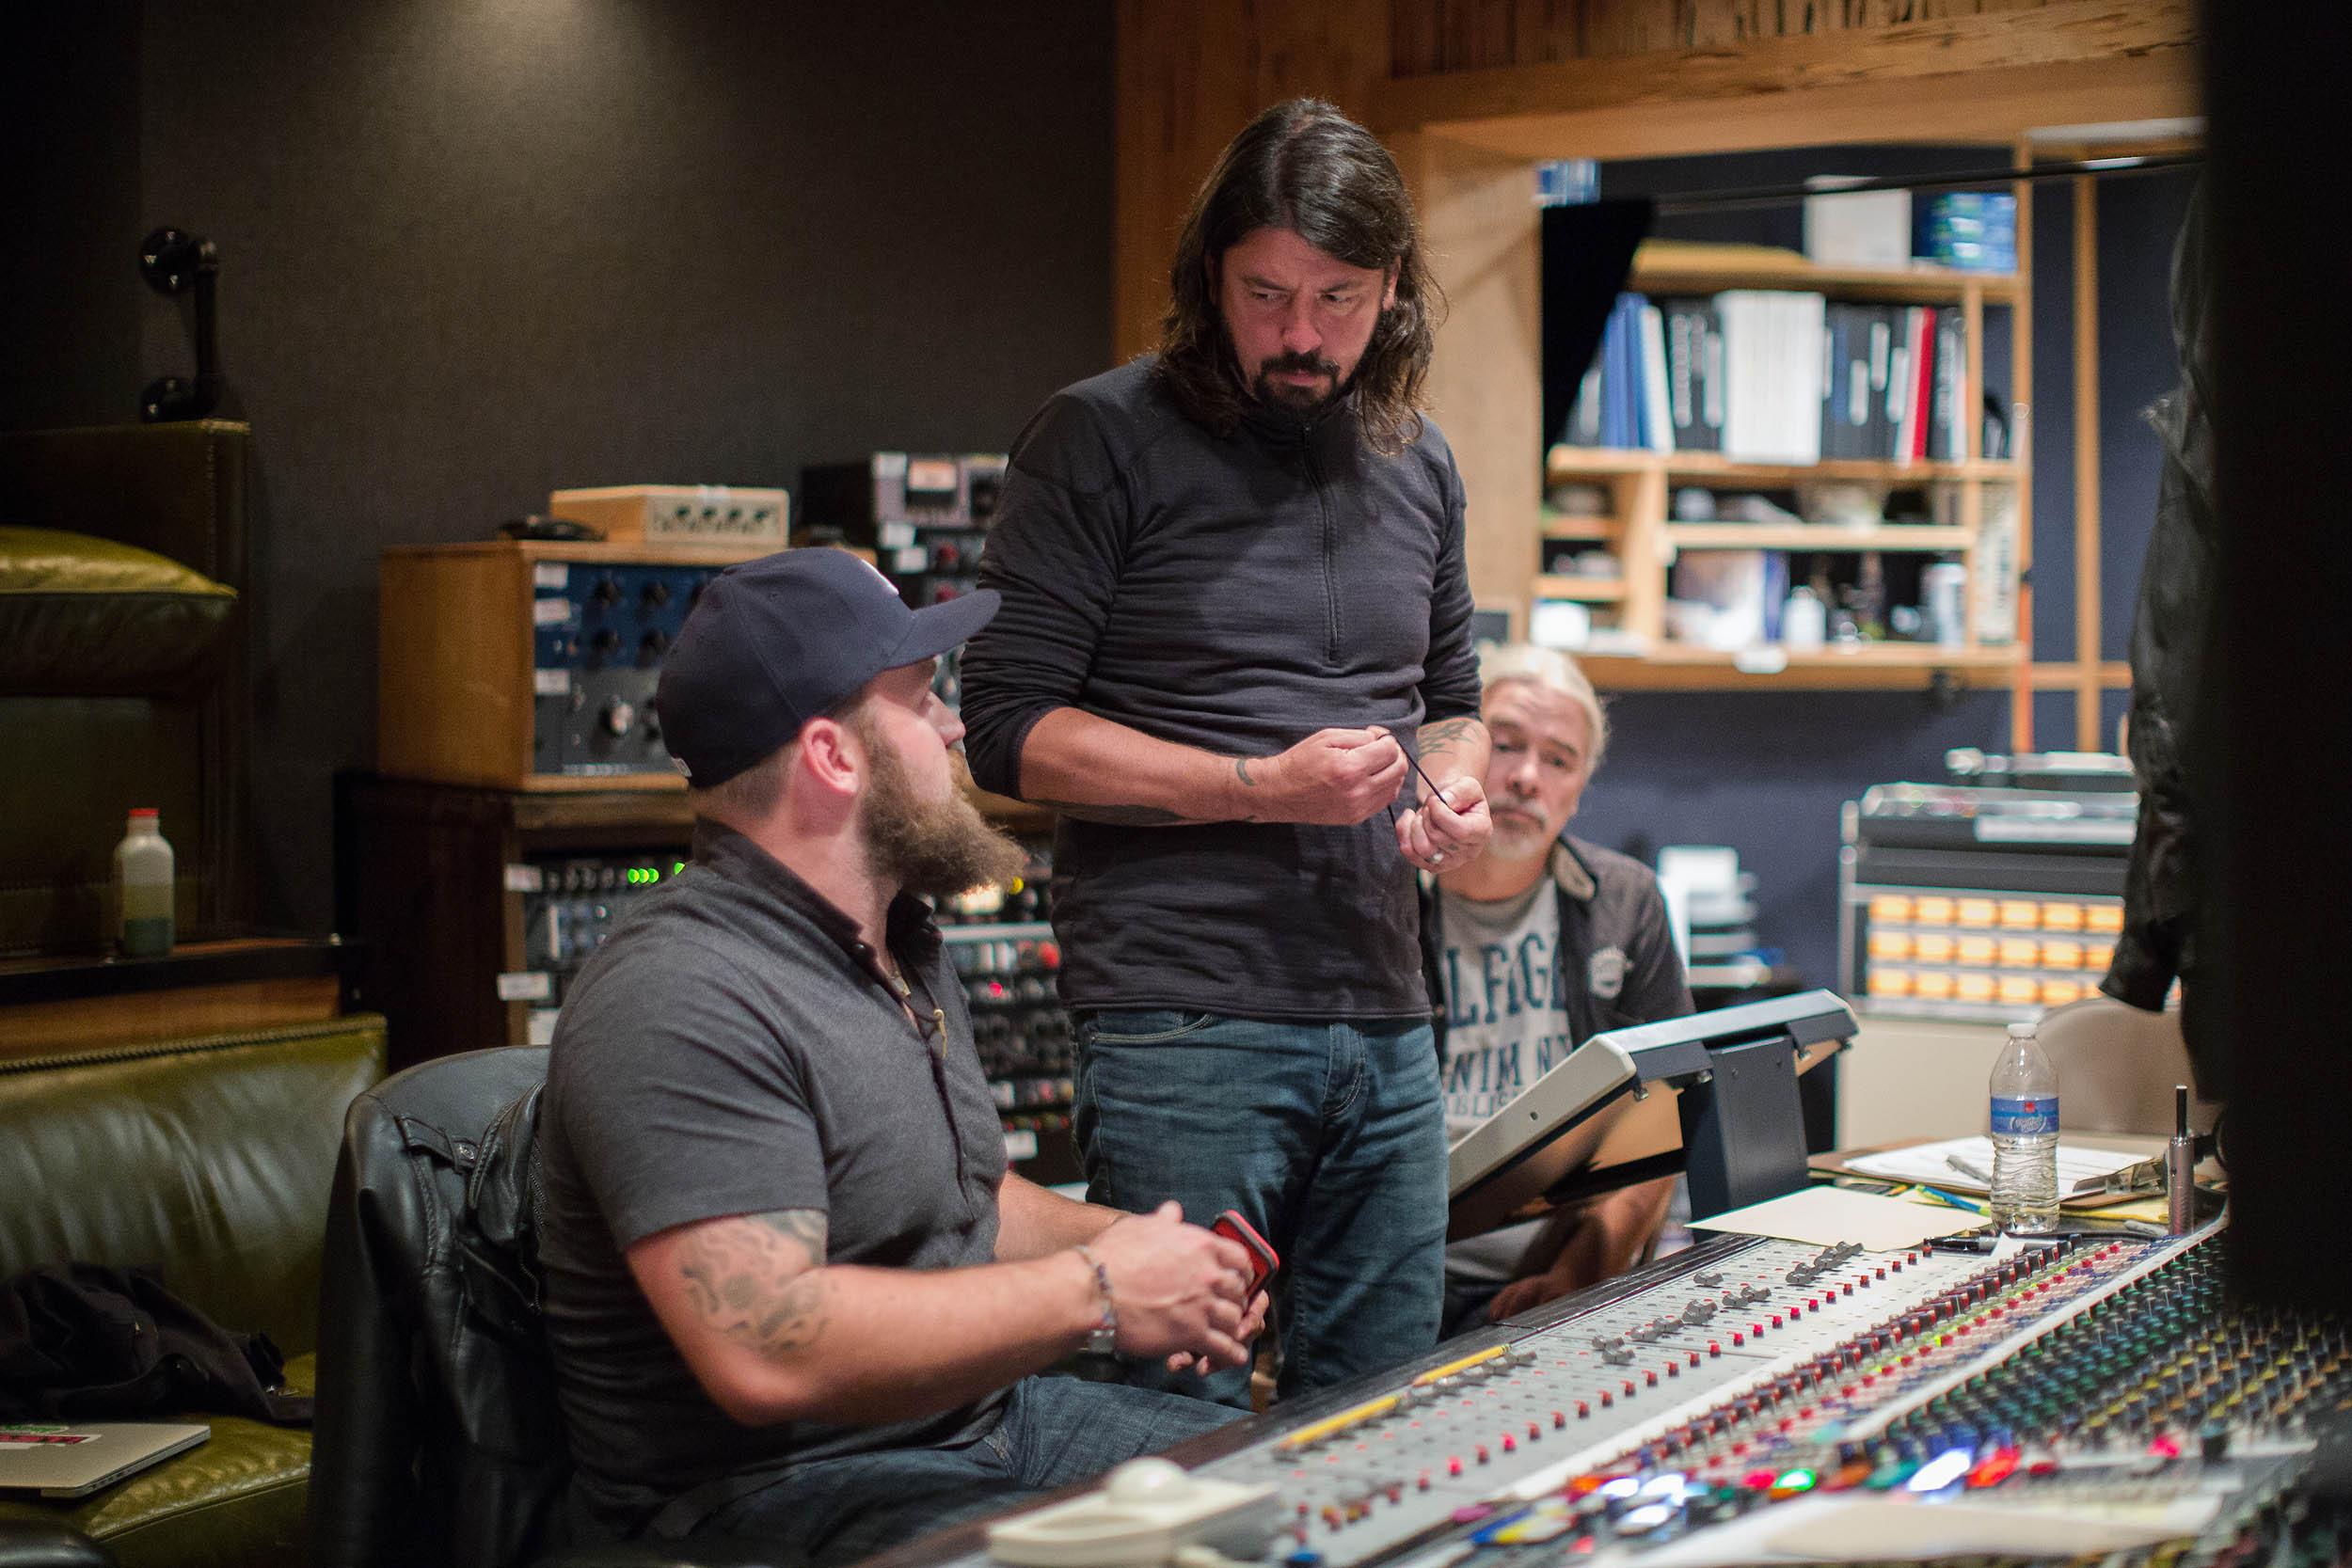 Foo Fighters in Nashville: Zac Brown Details 'Sonic Highways' Visit